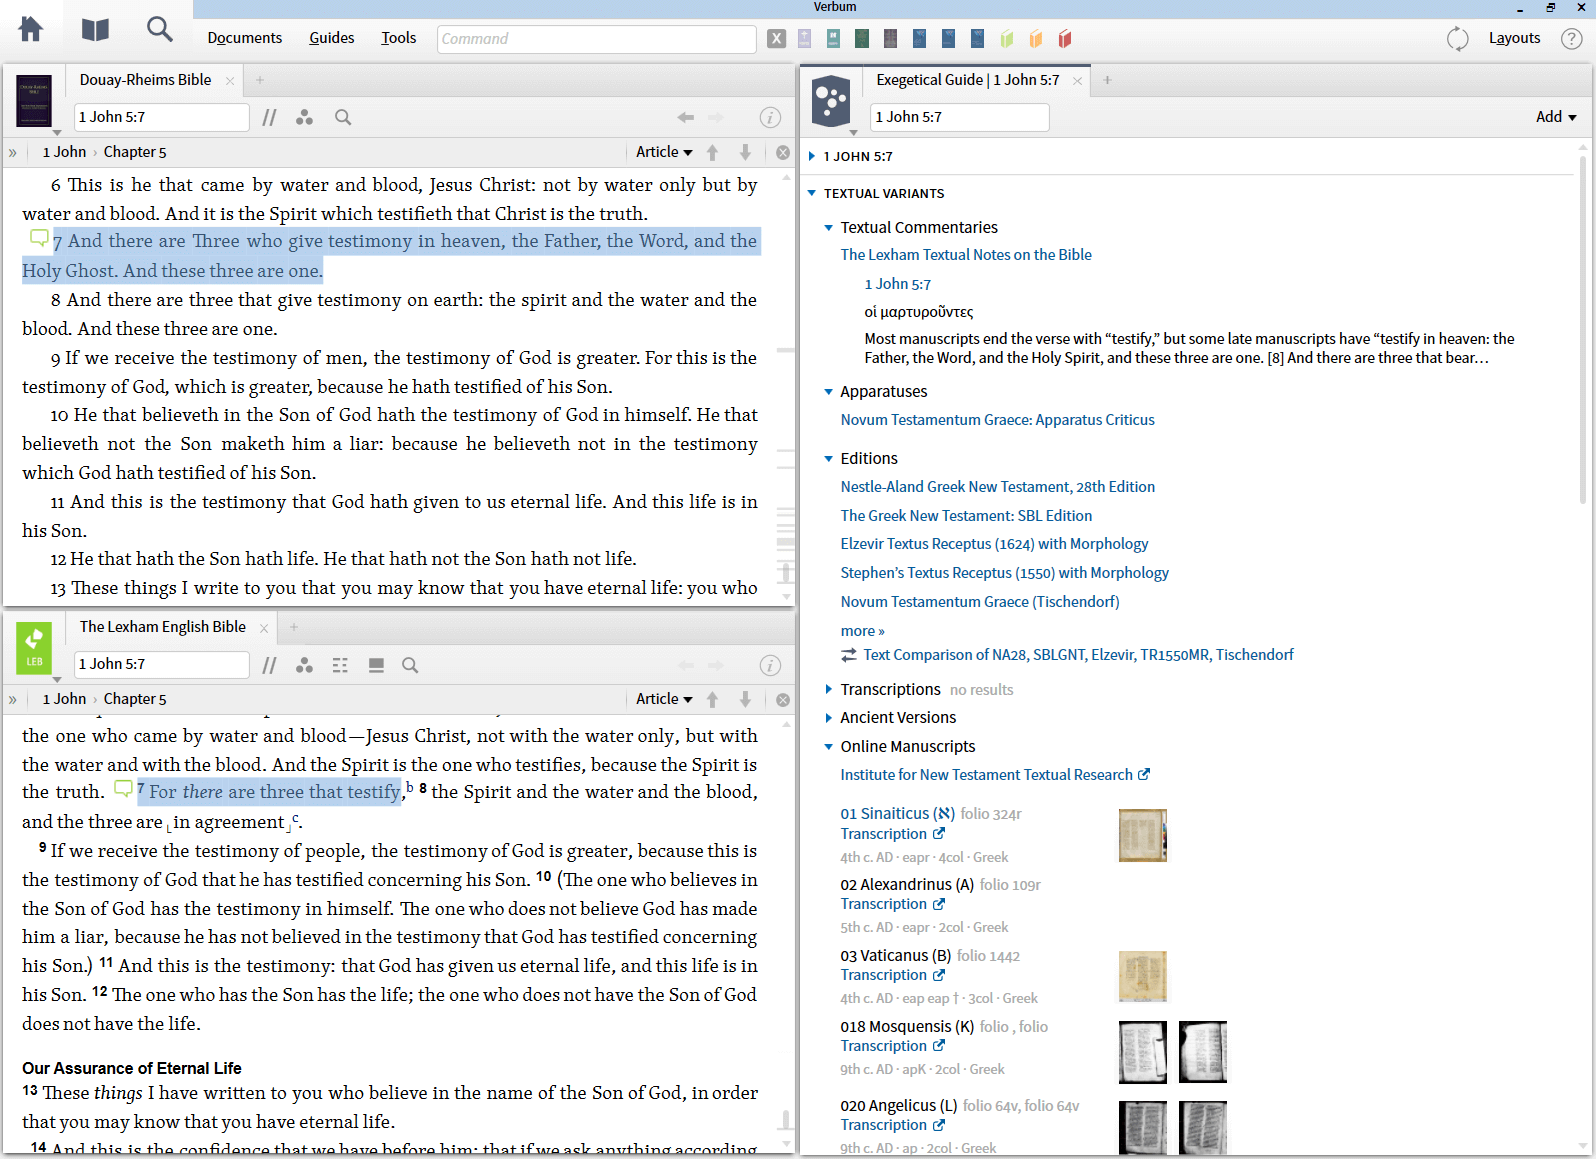 Understand textual variants for 1 John 5:7